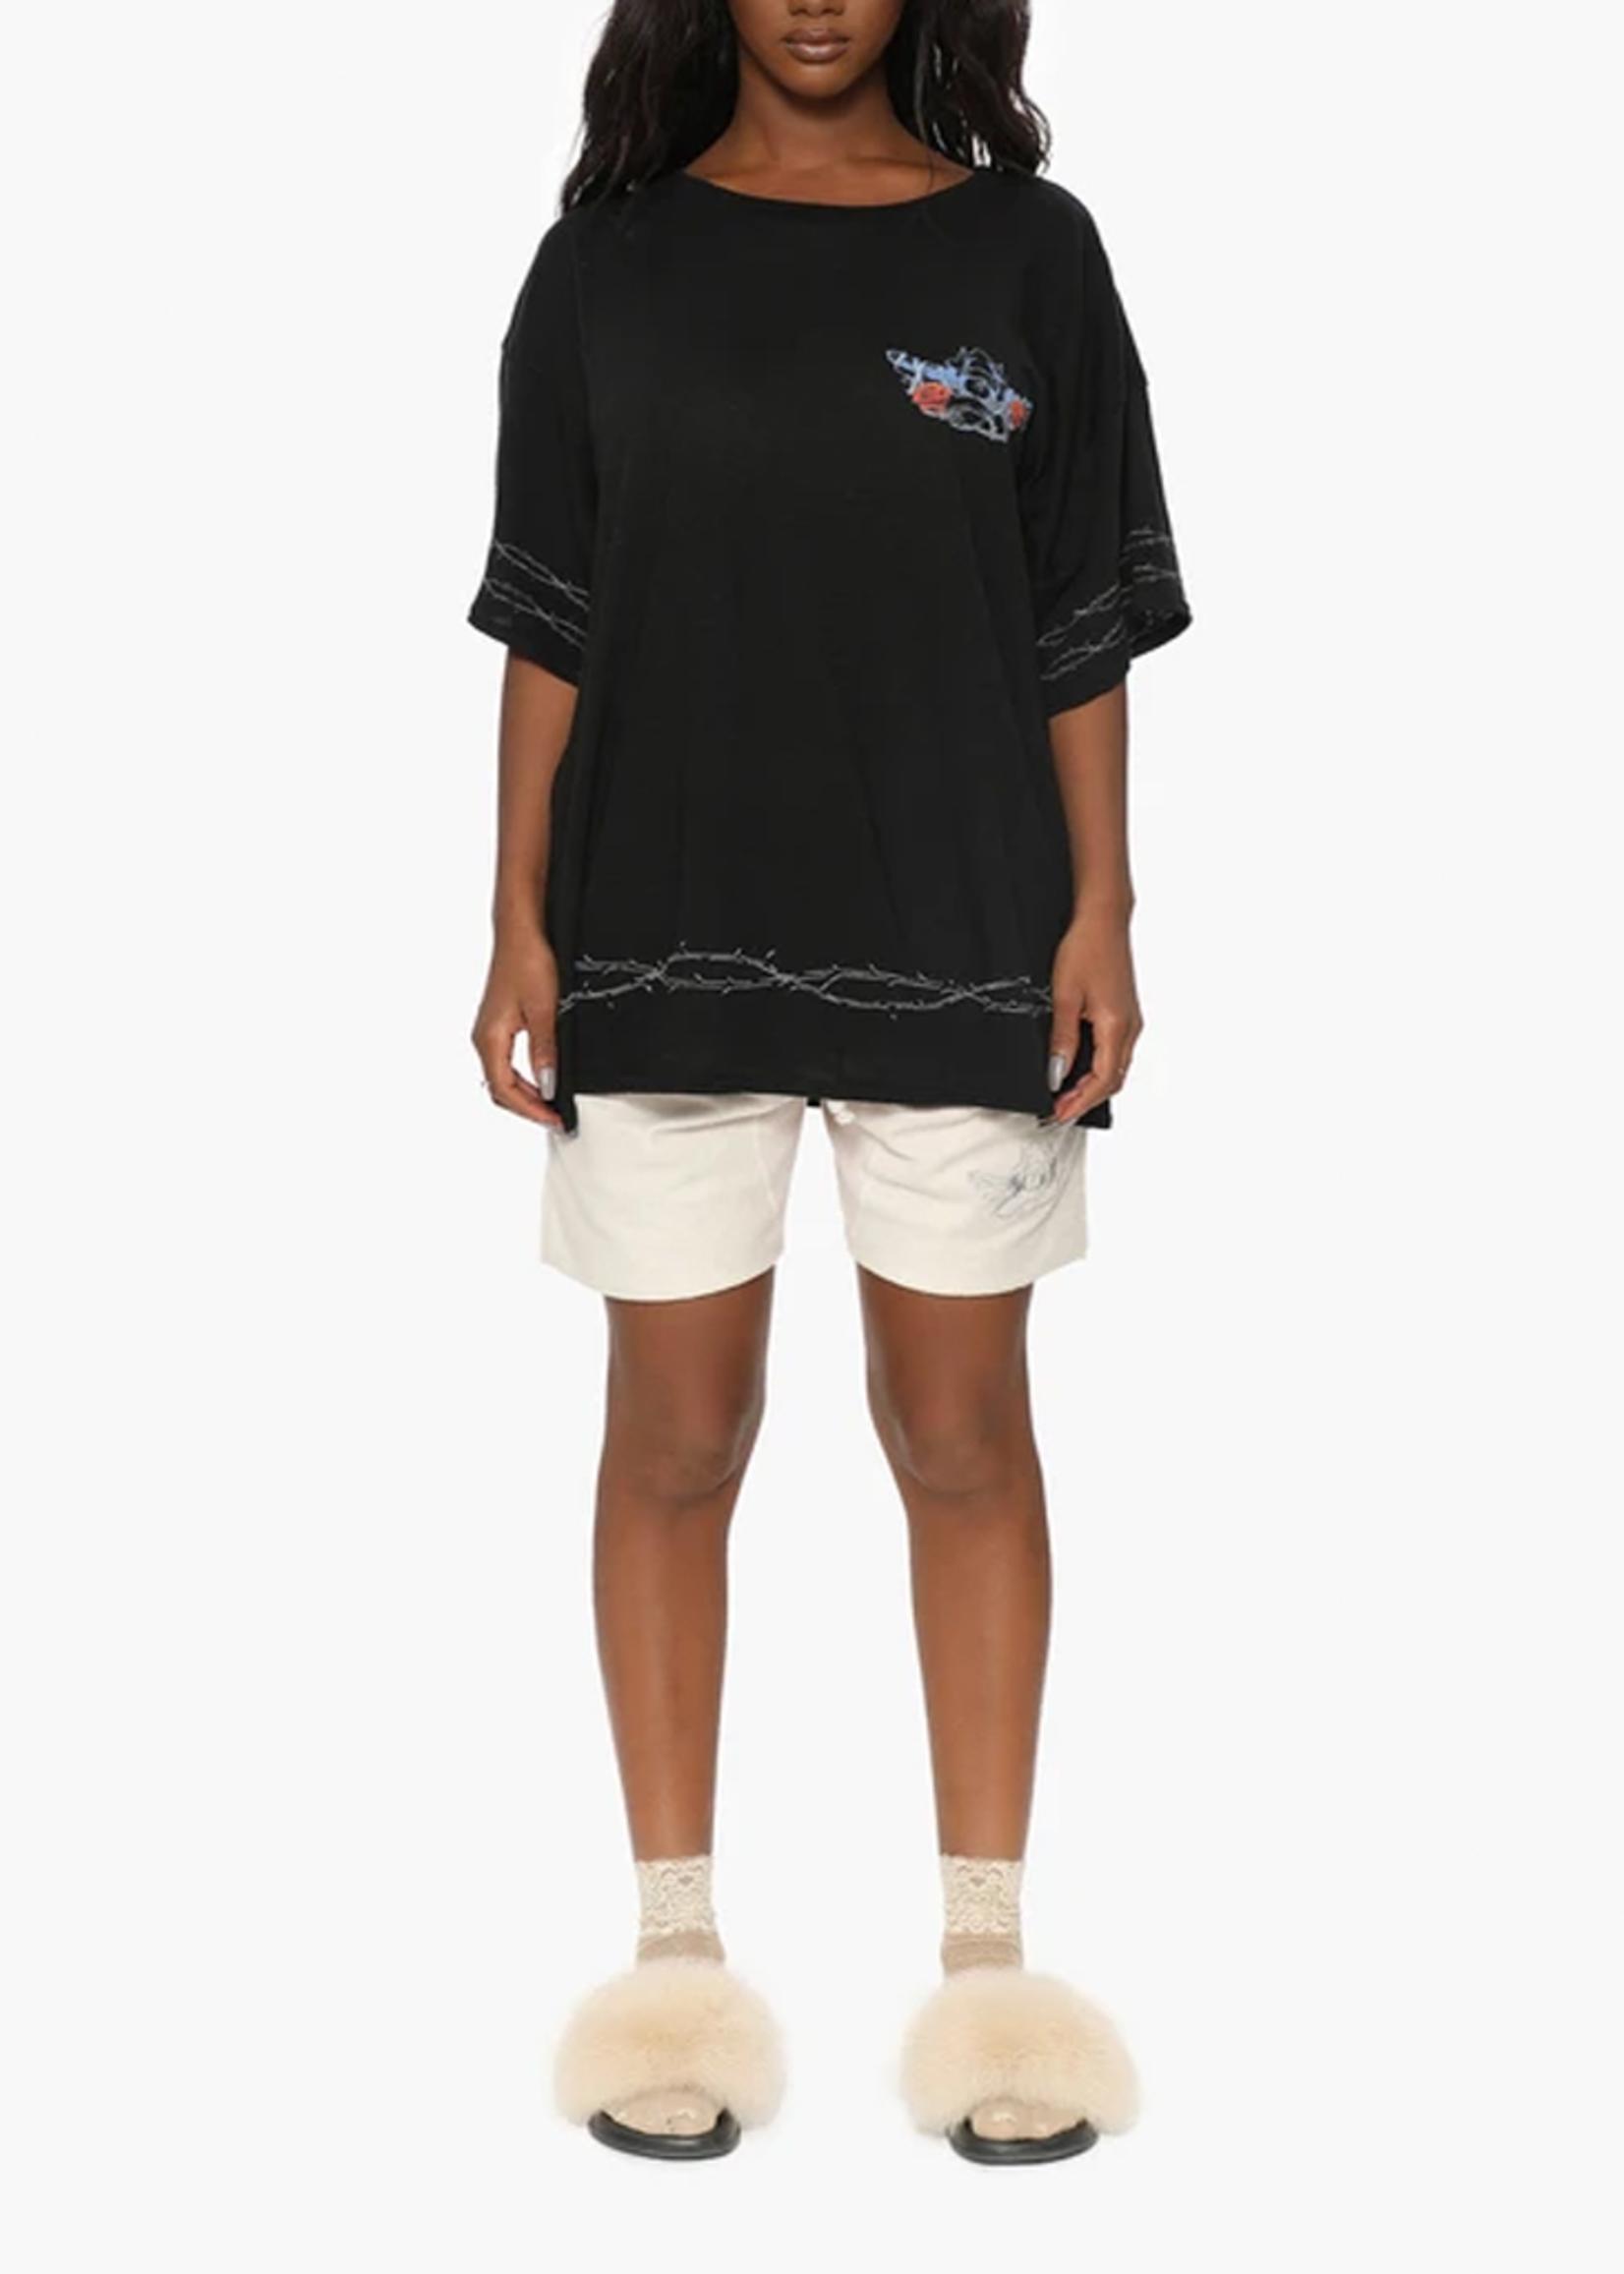 BOYS LIE BOYS LIE / Love at First Bite T-Shirts